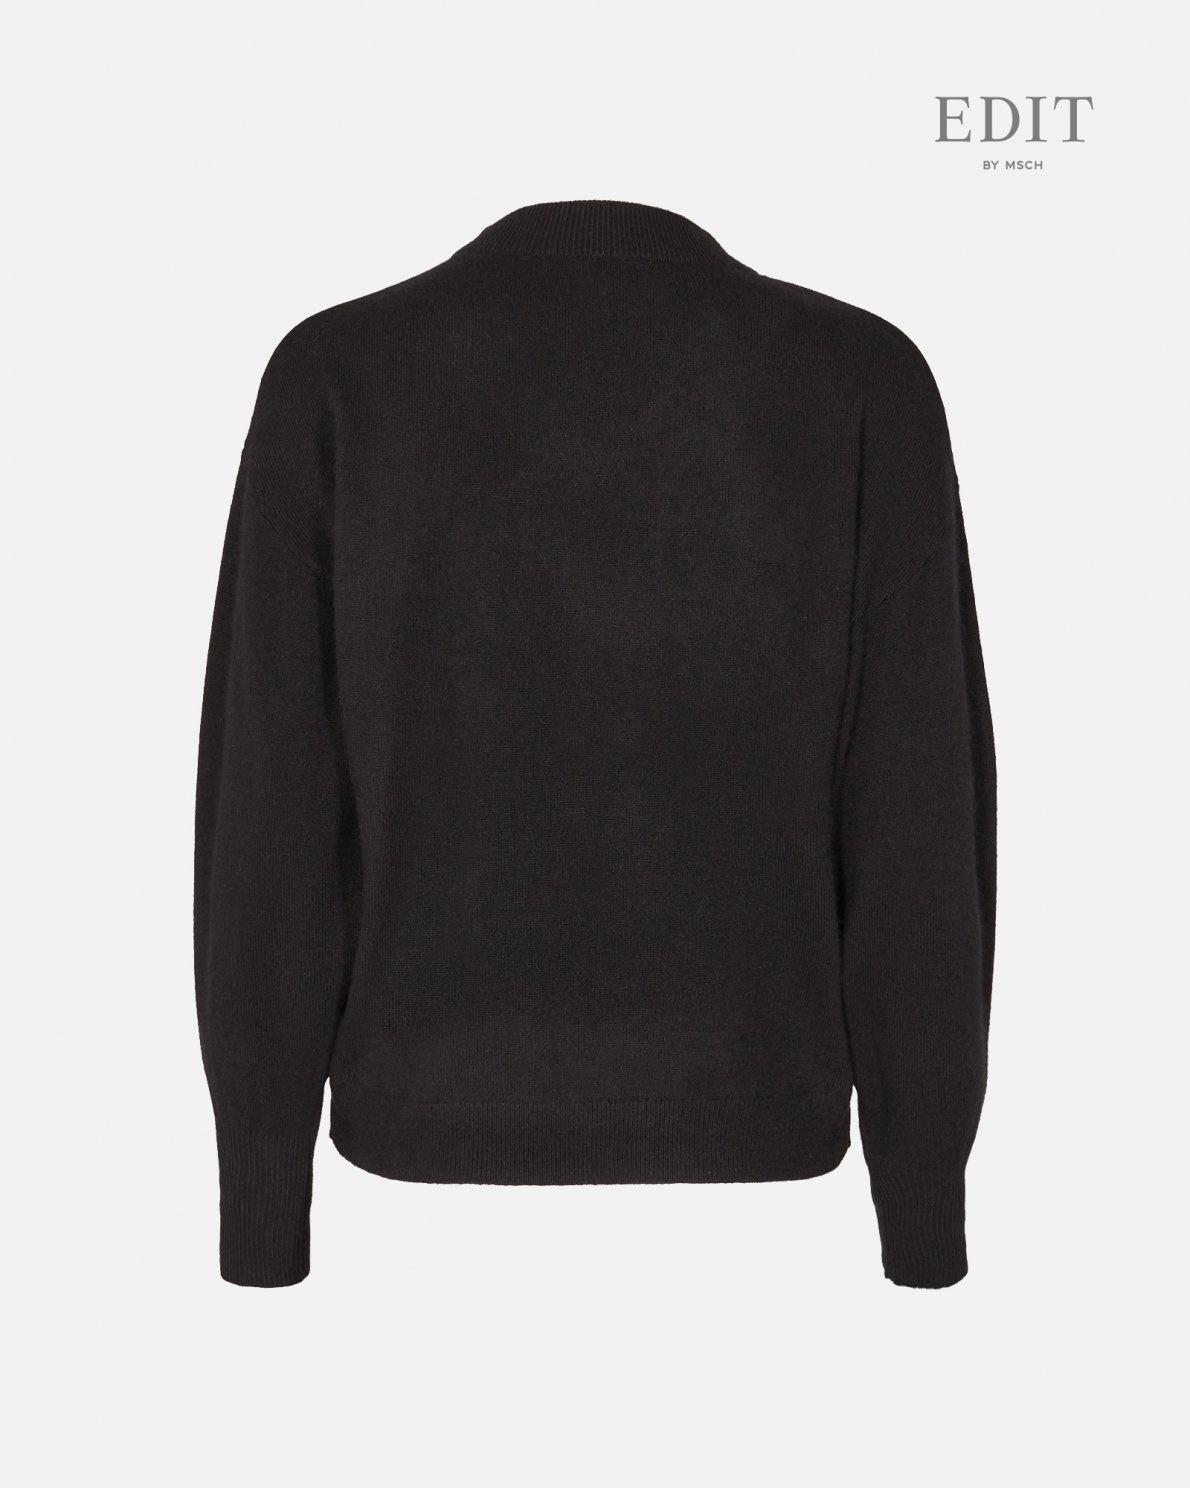 Ingo Black Wool Pullover-2